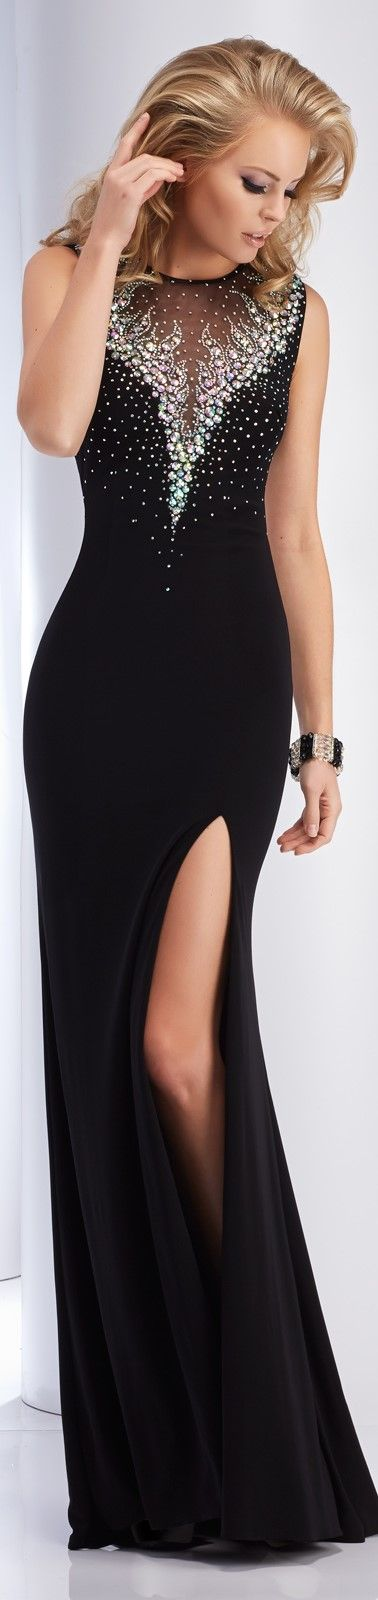 Clarisse Prom Dress 2736Authenticity Guaranteed